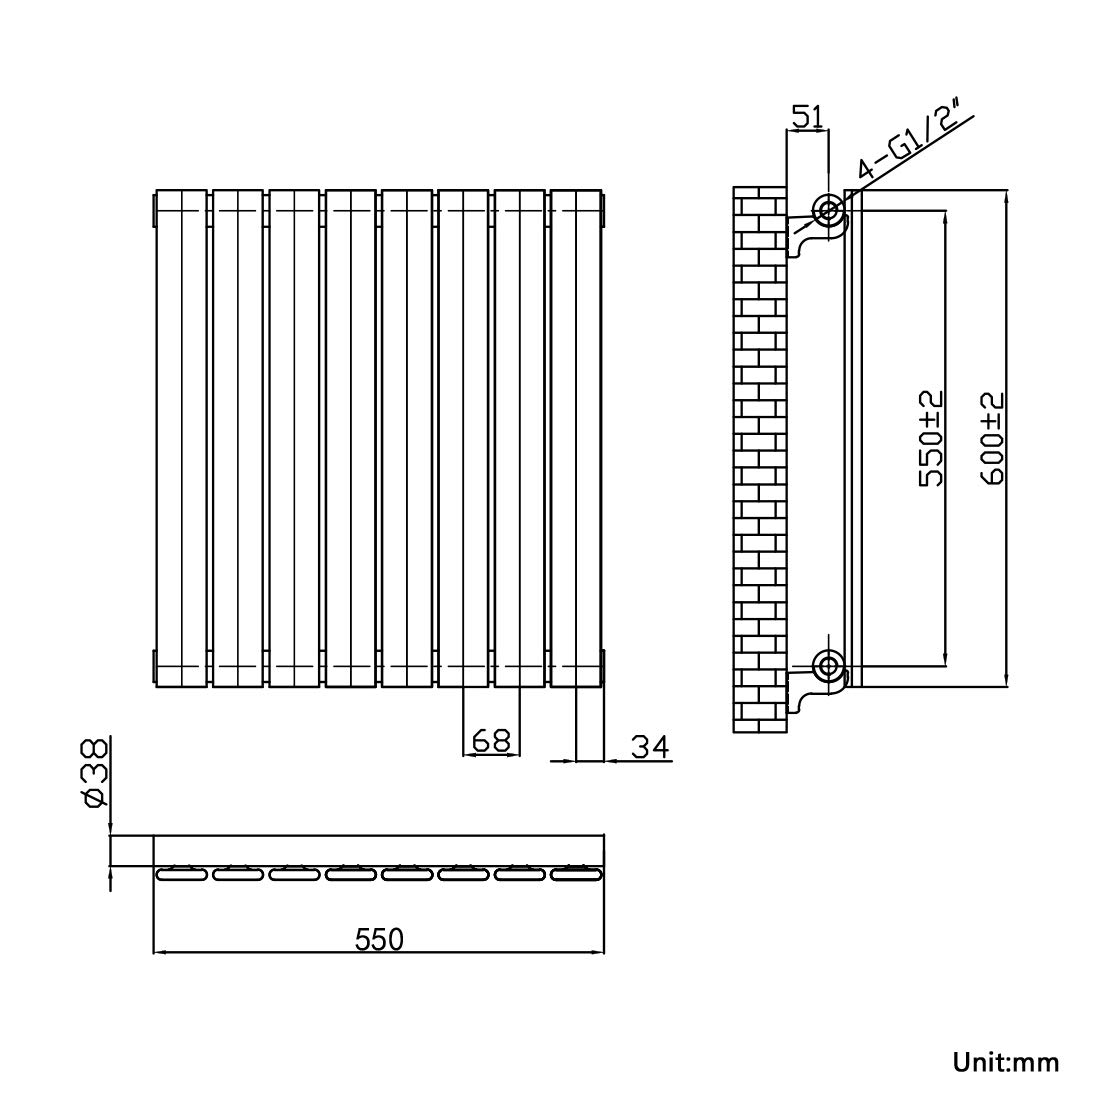 EMKE 600 x 550 mm Horizontal Column Designer Radiator Single Flat Panel White Bathroom Central Heating Radiators